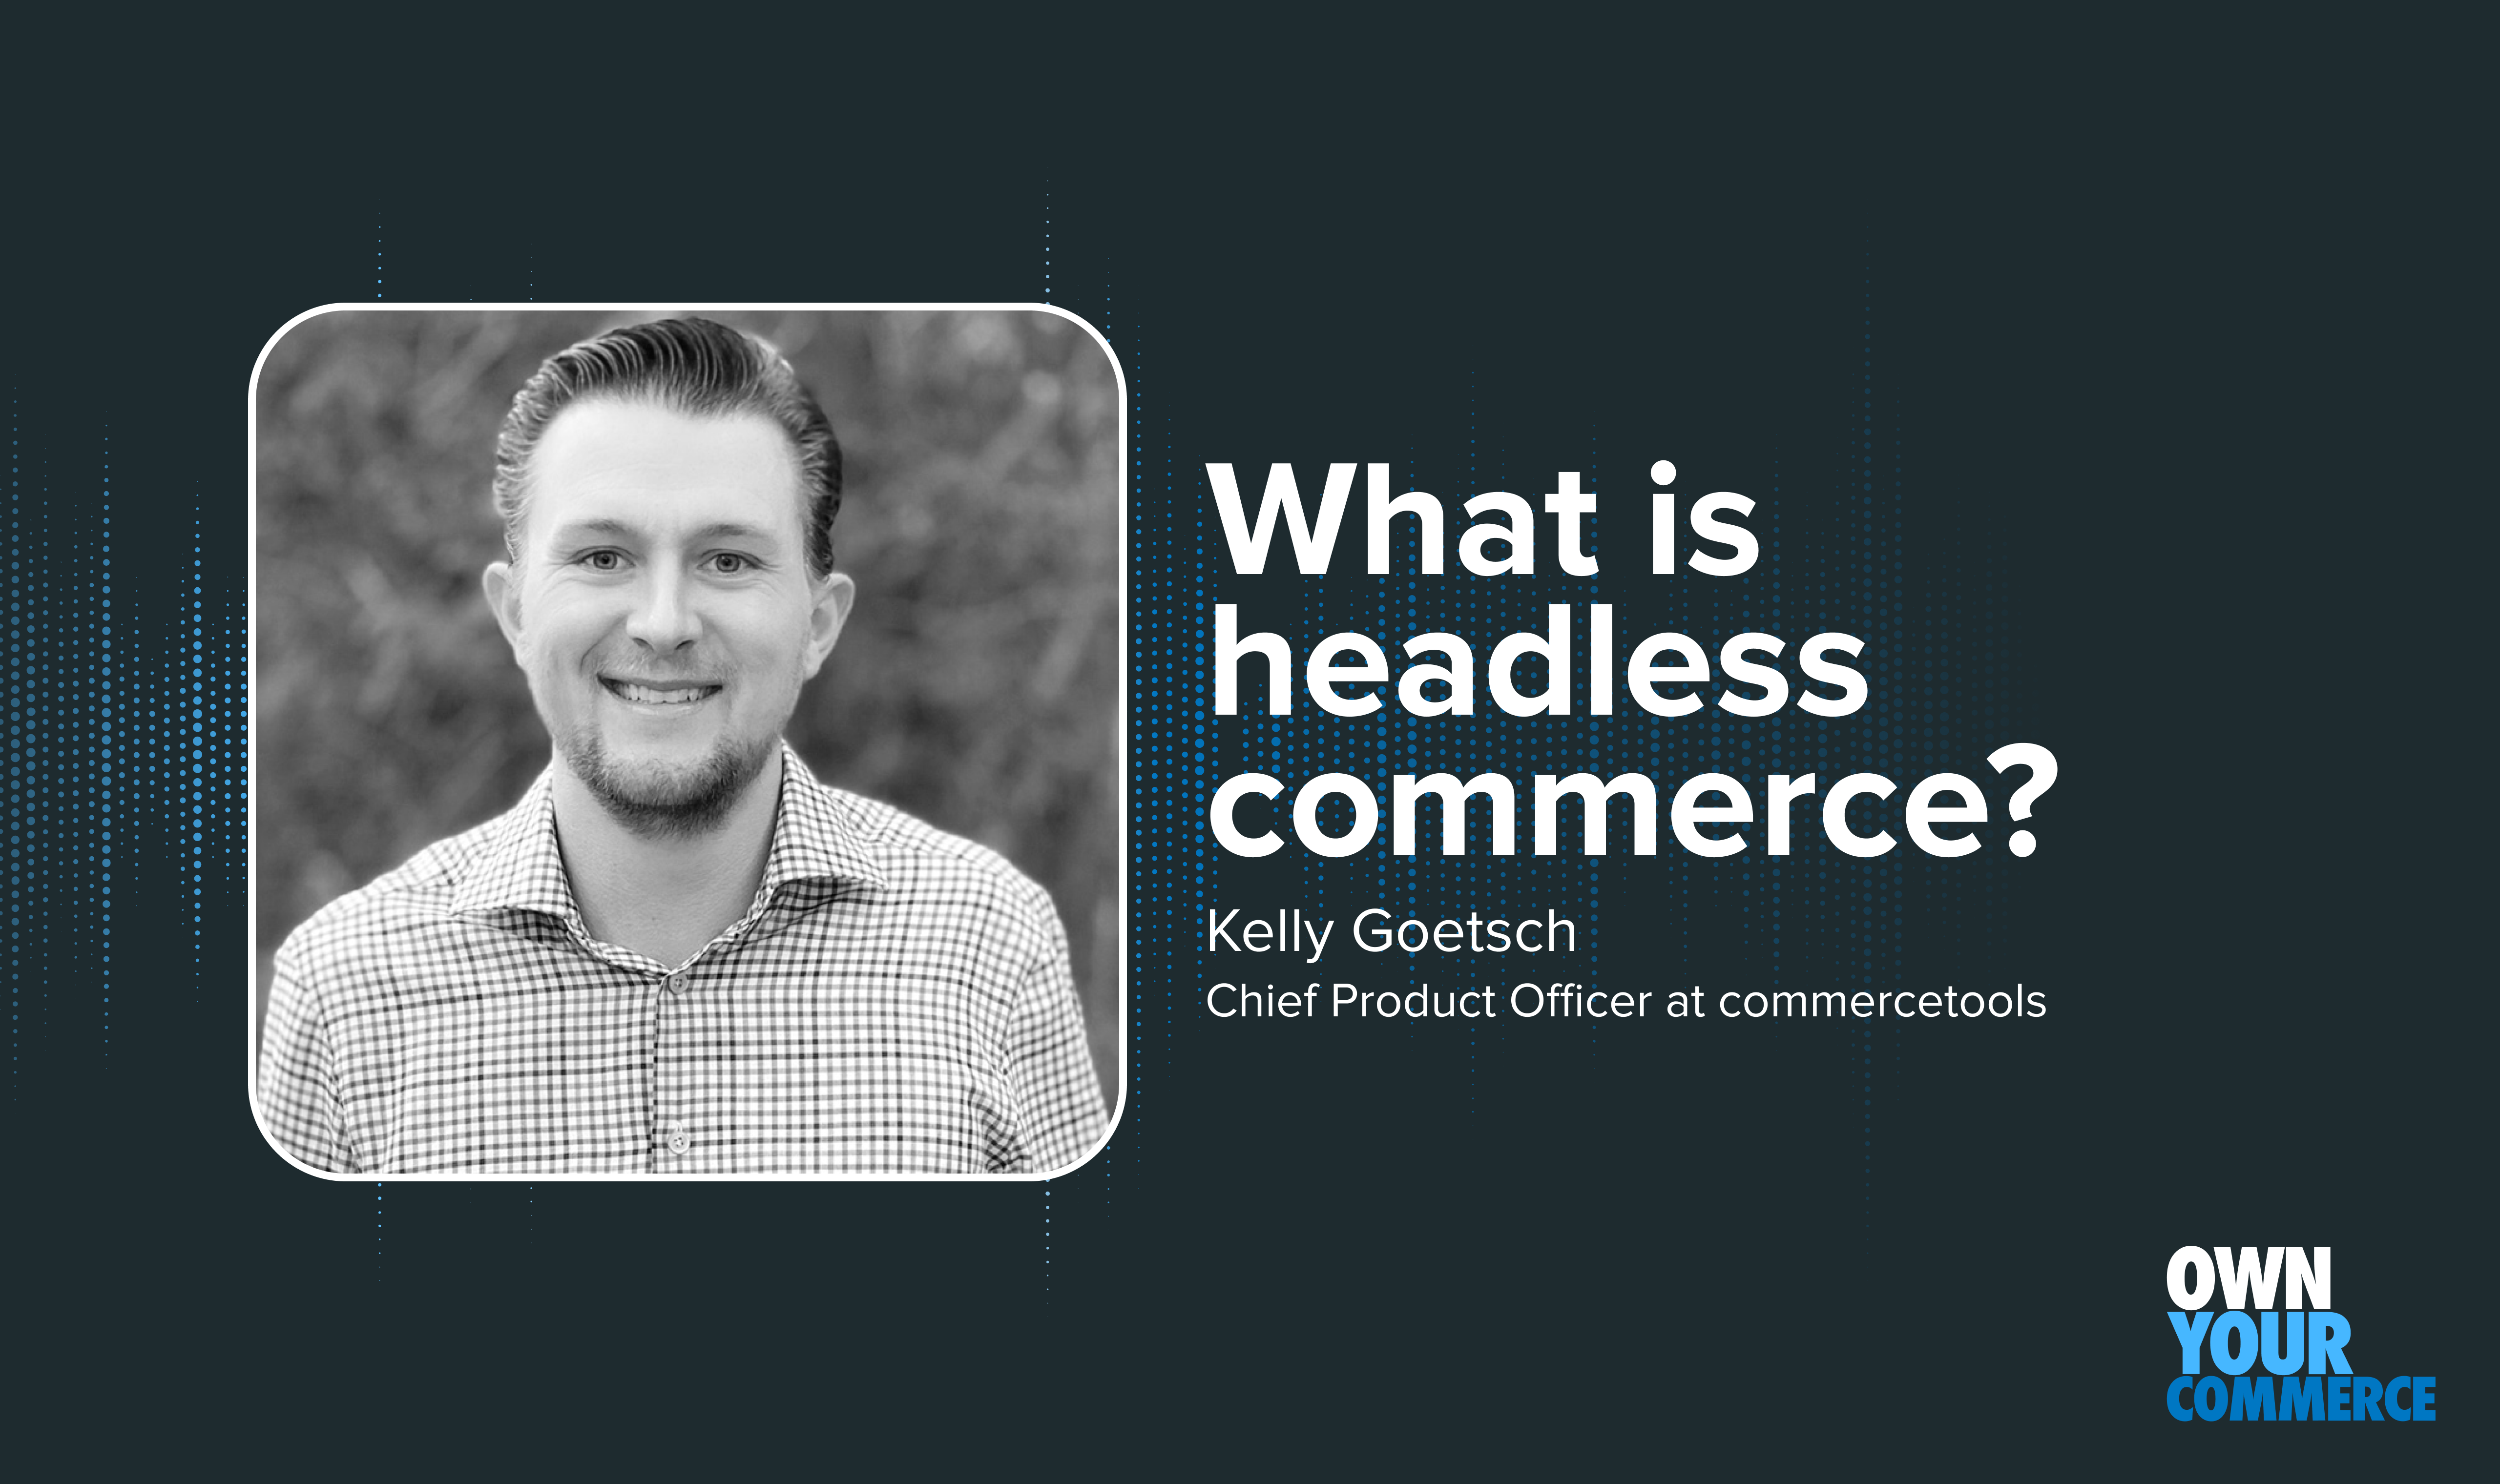 blog banner featuring Kelly Goetsch